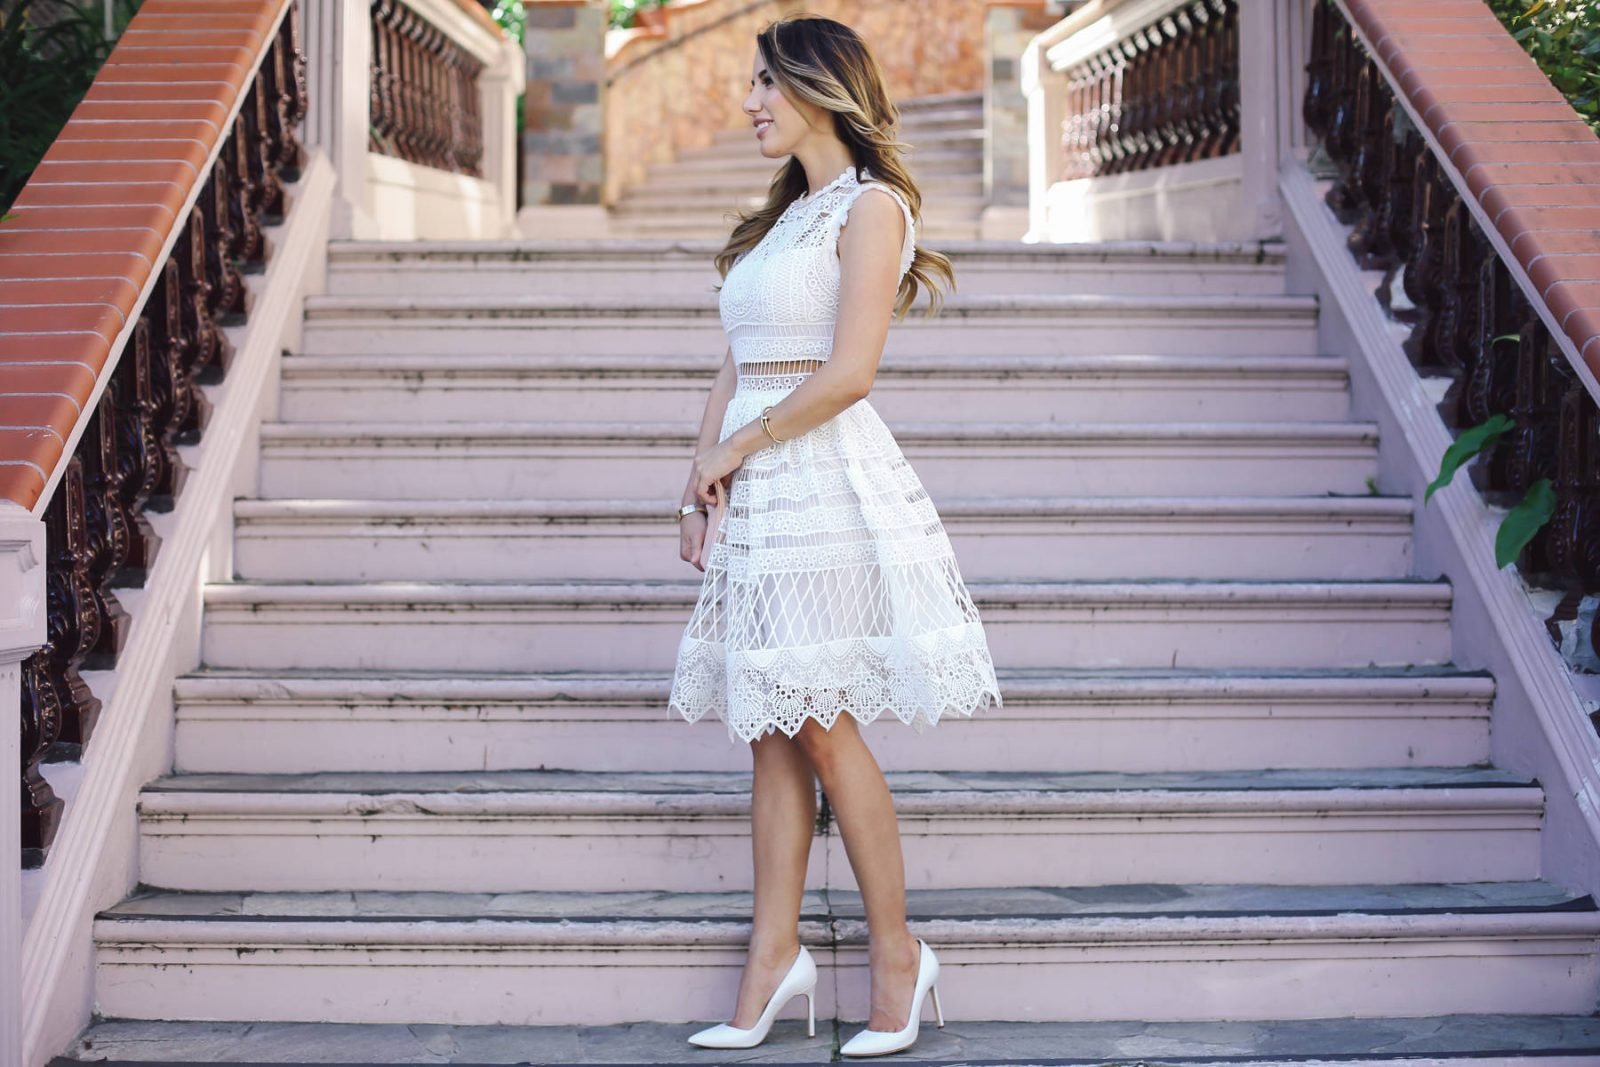 Ariana-Lauren-Fashionborn-White-Laced-Skater-Dress-Fashion-Blogger-Photography-by-Ryan-Chua-8672